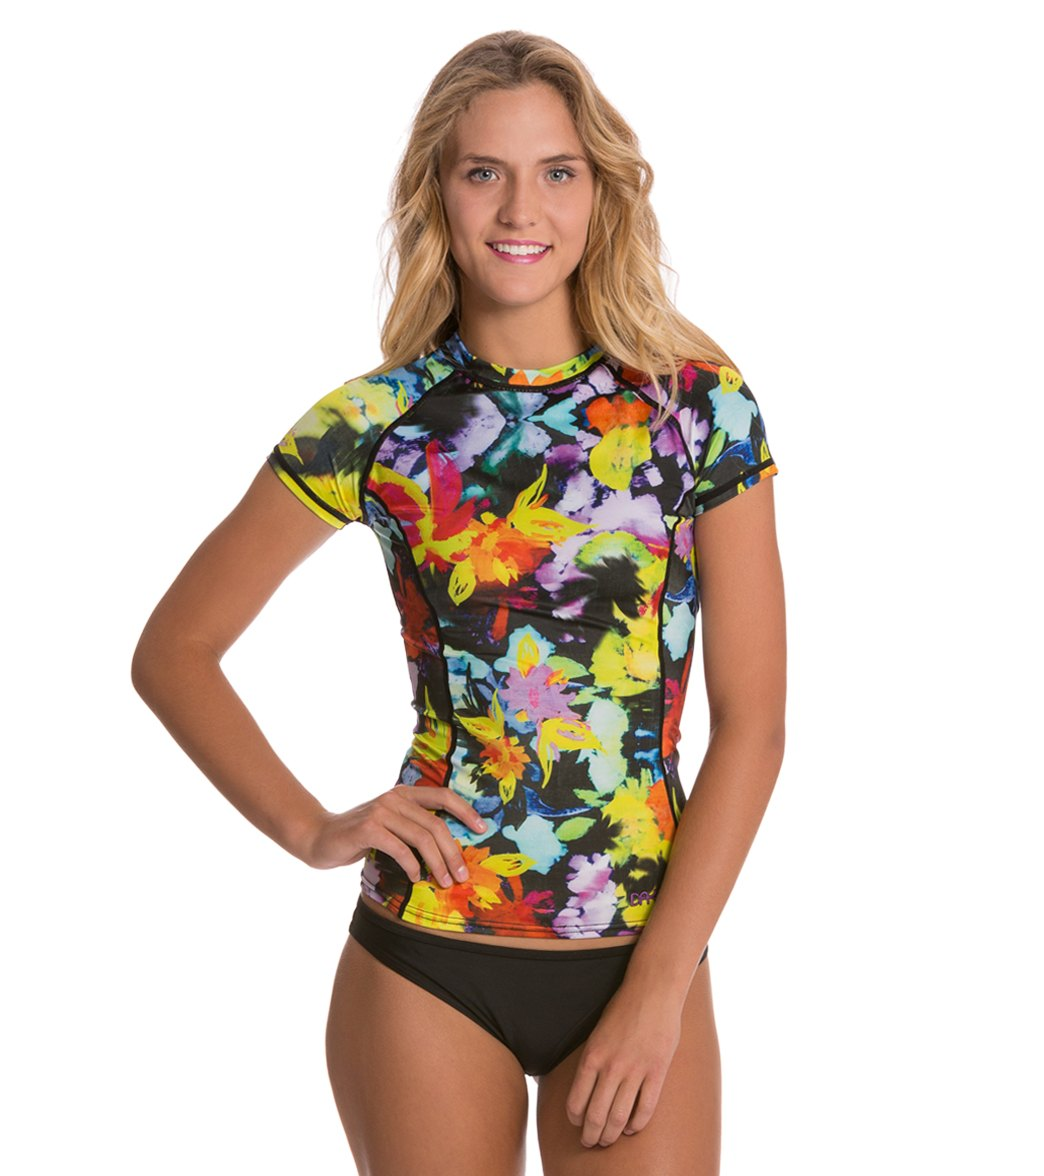 53dfeea76f3 Dakine Women's Tech Cap Sleeve Rashguard at SwimOutlet.com